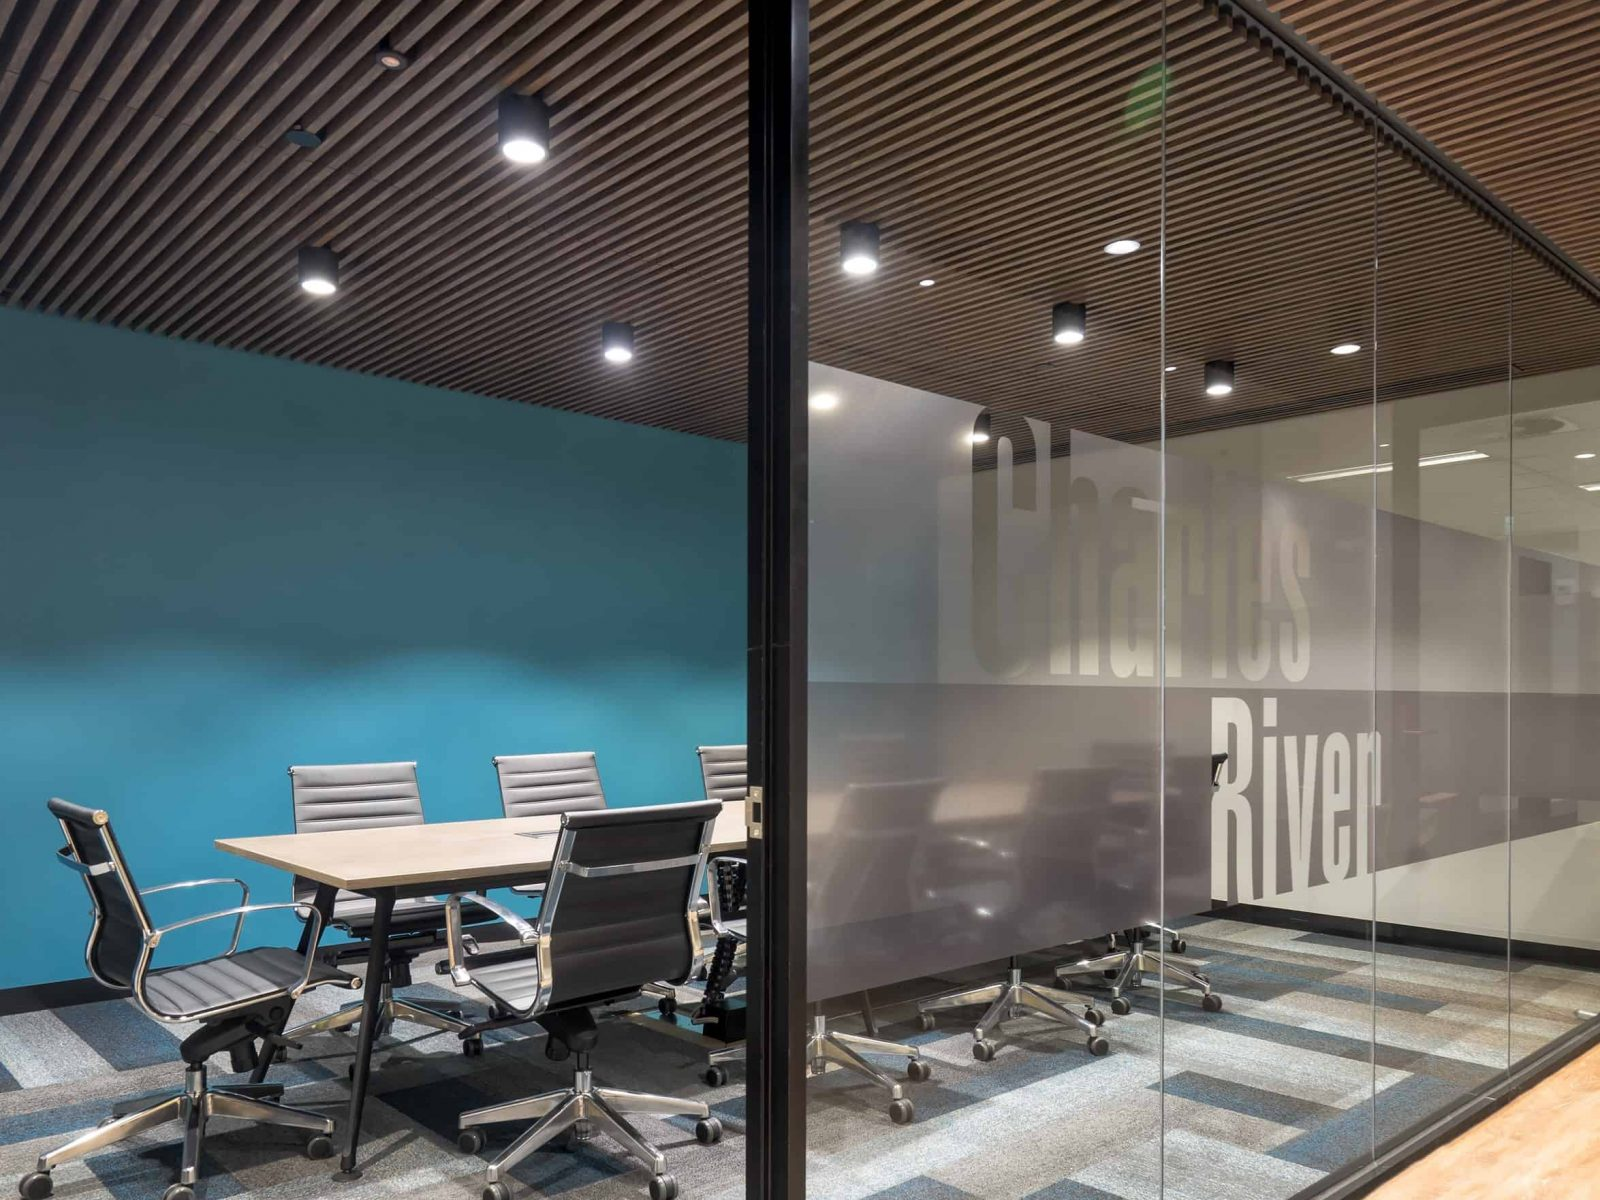 Office Fitouts Melbourne, Charles River | Contour Interiors